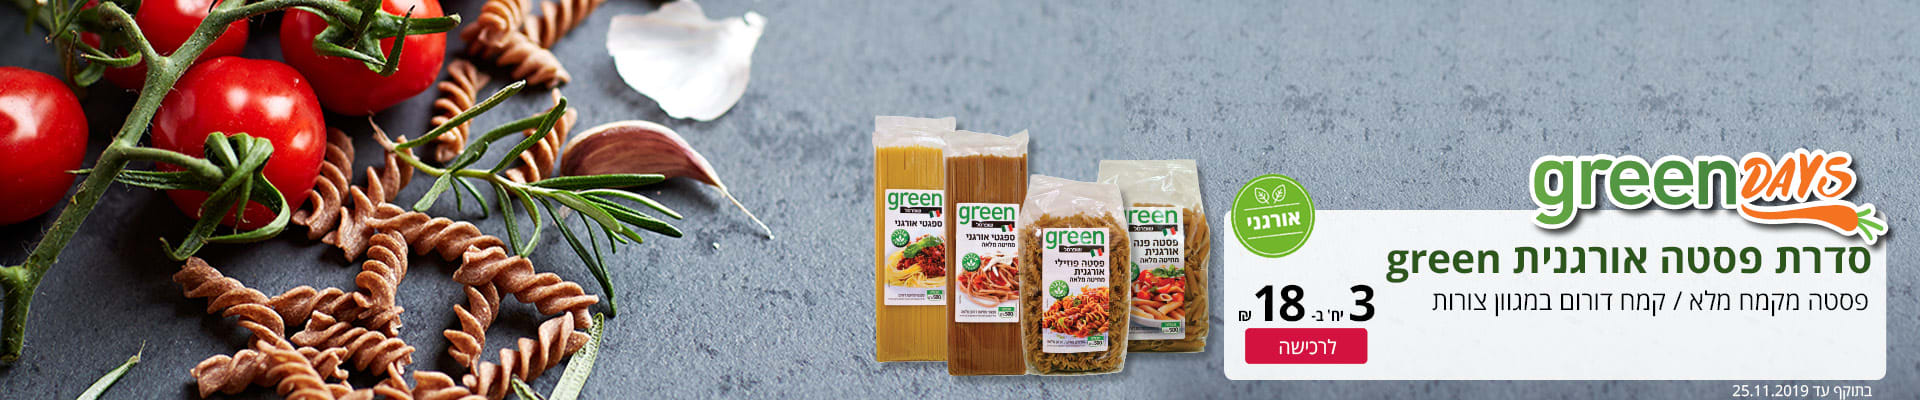 GREEN DAYS סדרת פסטה אורגנית GREEN . פסטה מקמח מלא/ קמח דורום במגוון צורות. 3 יח' ב-18 ₪. בתוקף עד ה-25.11.19